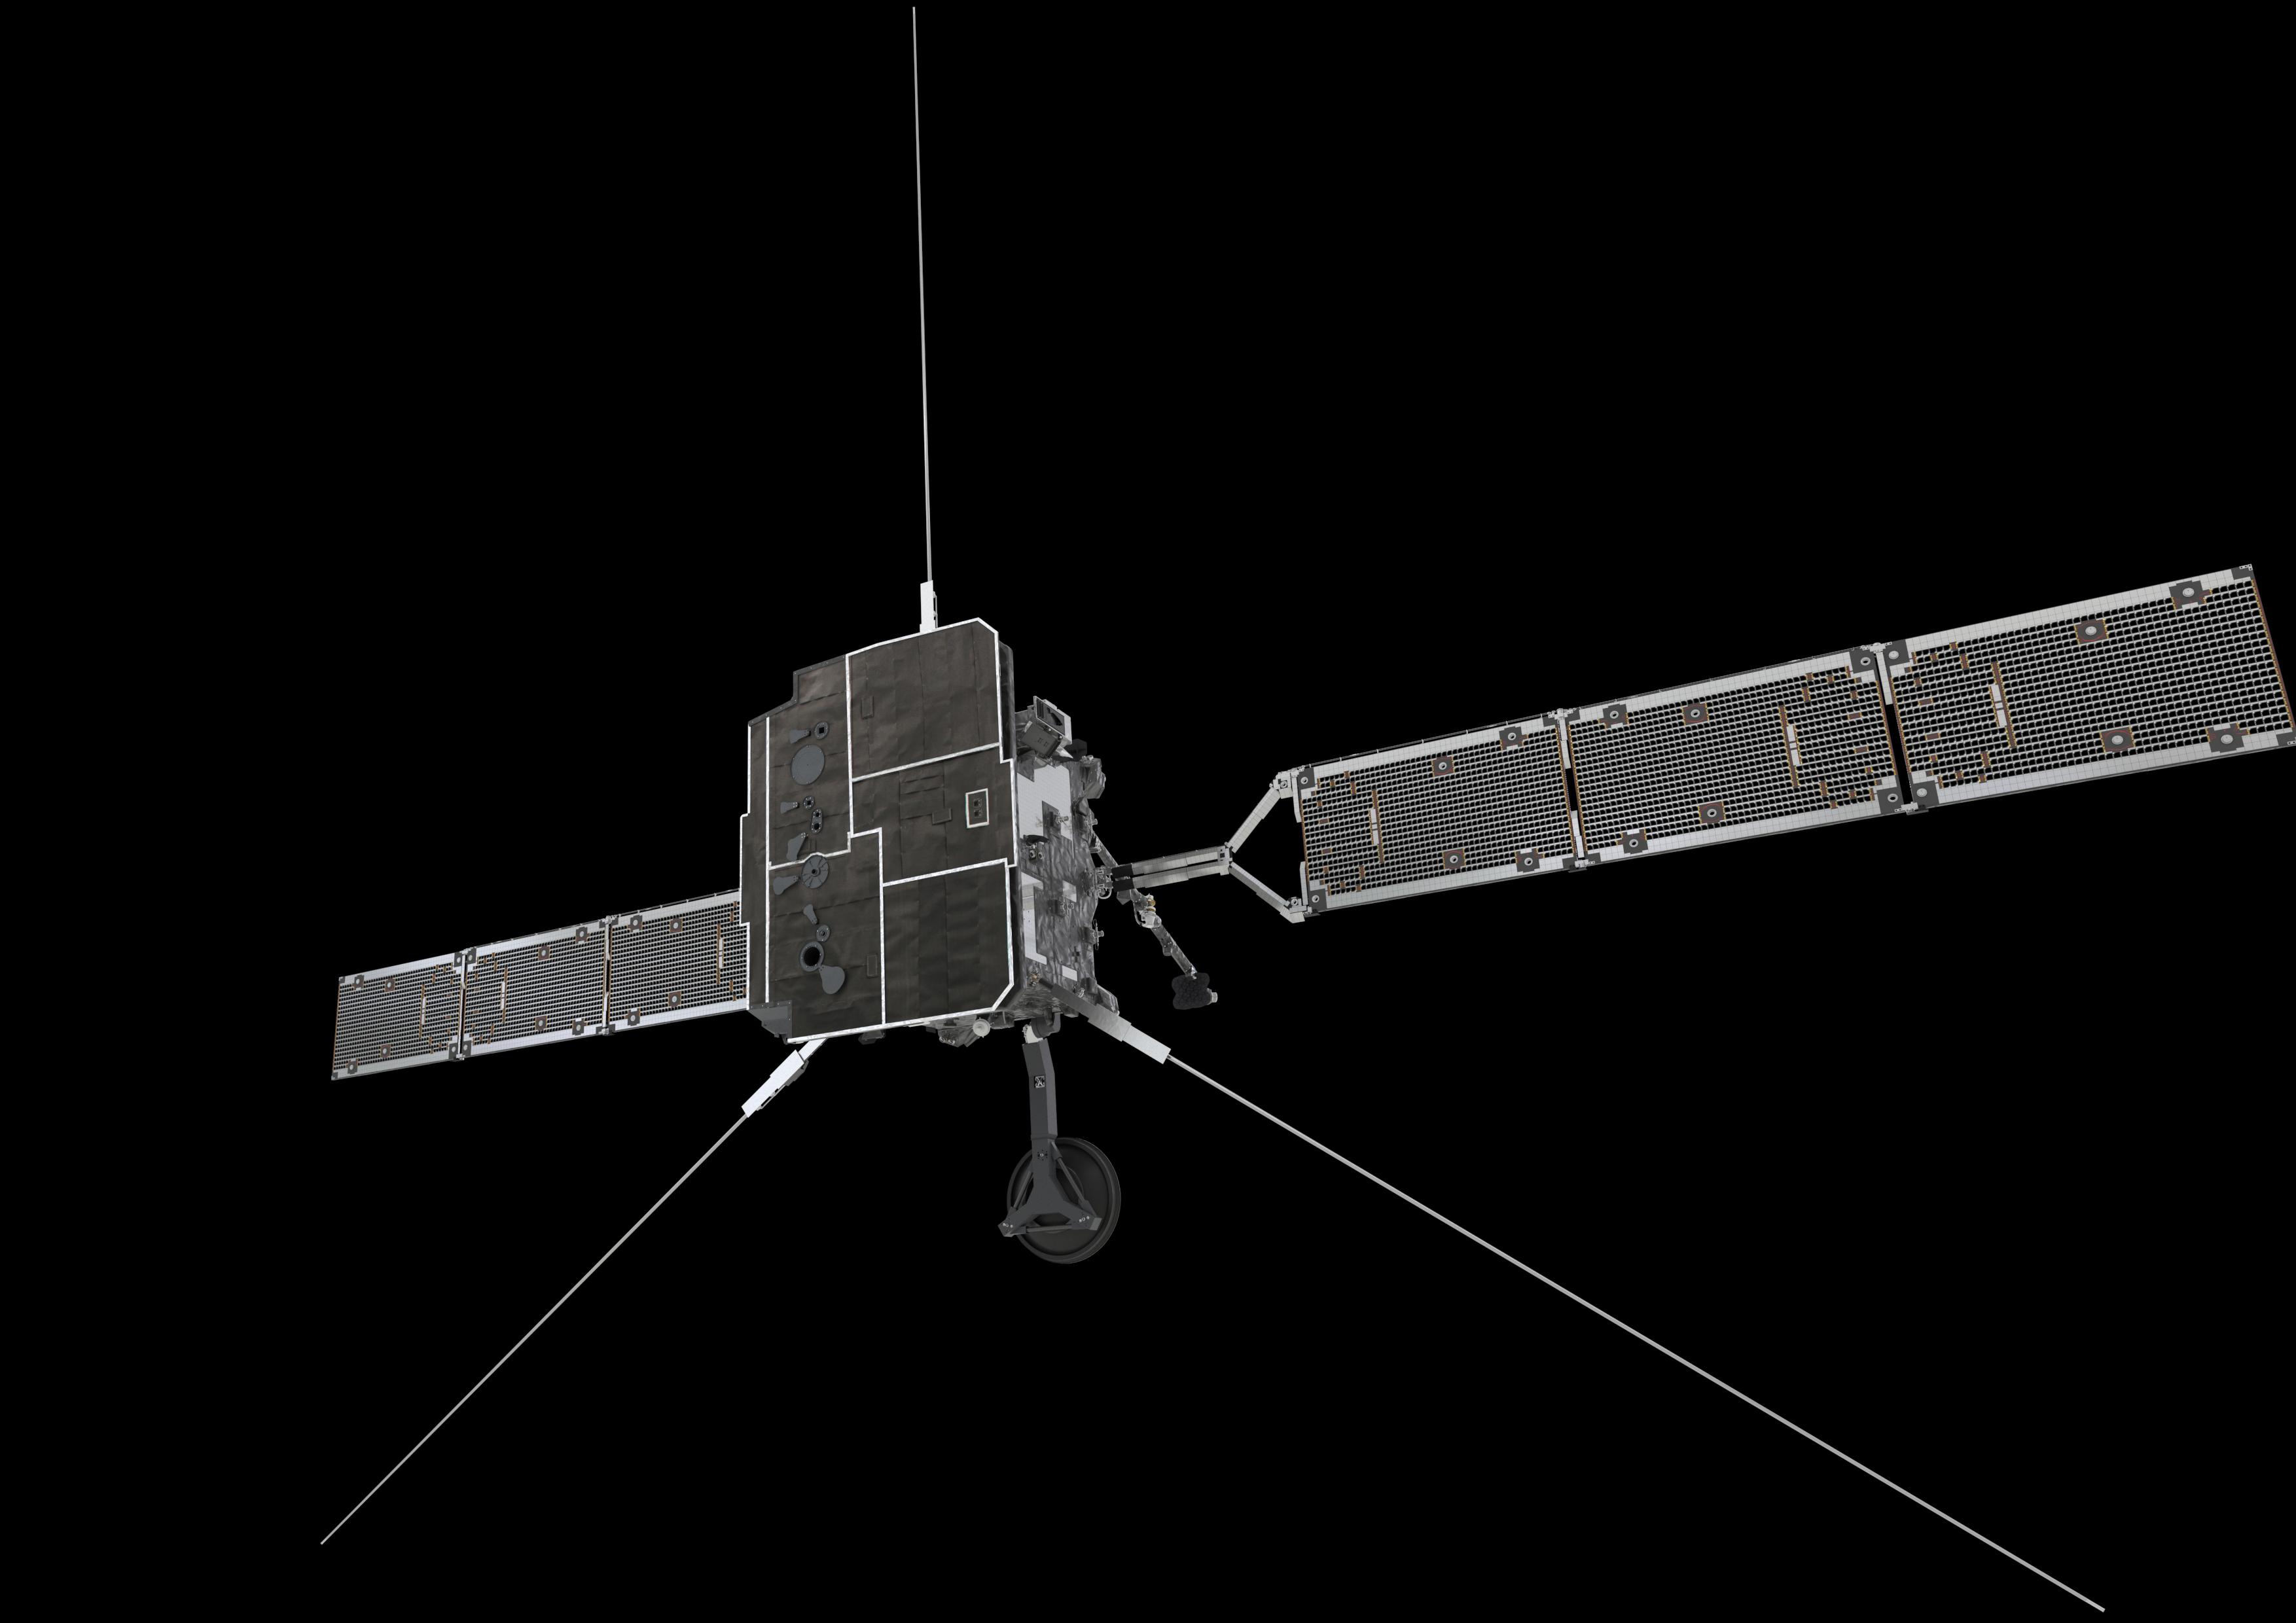 Solar_Orbiter_artist_impression_20190916_12.png